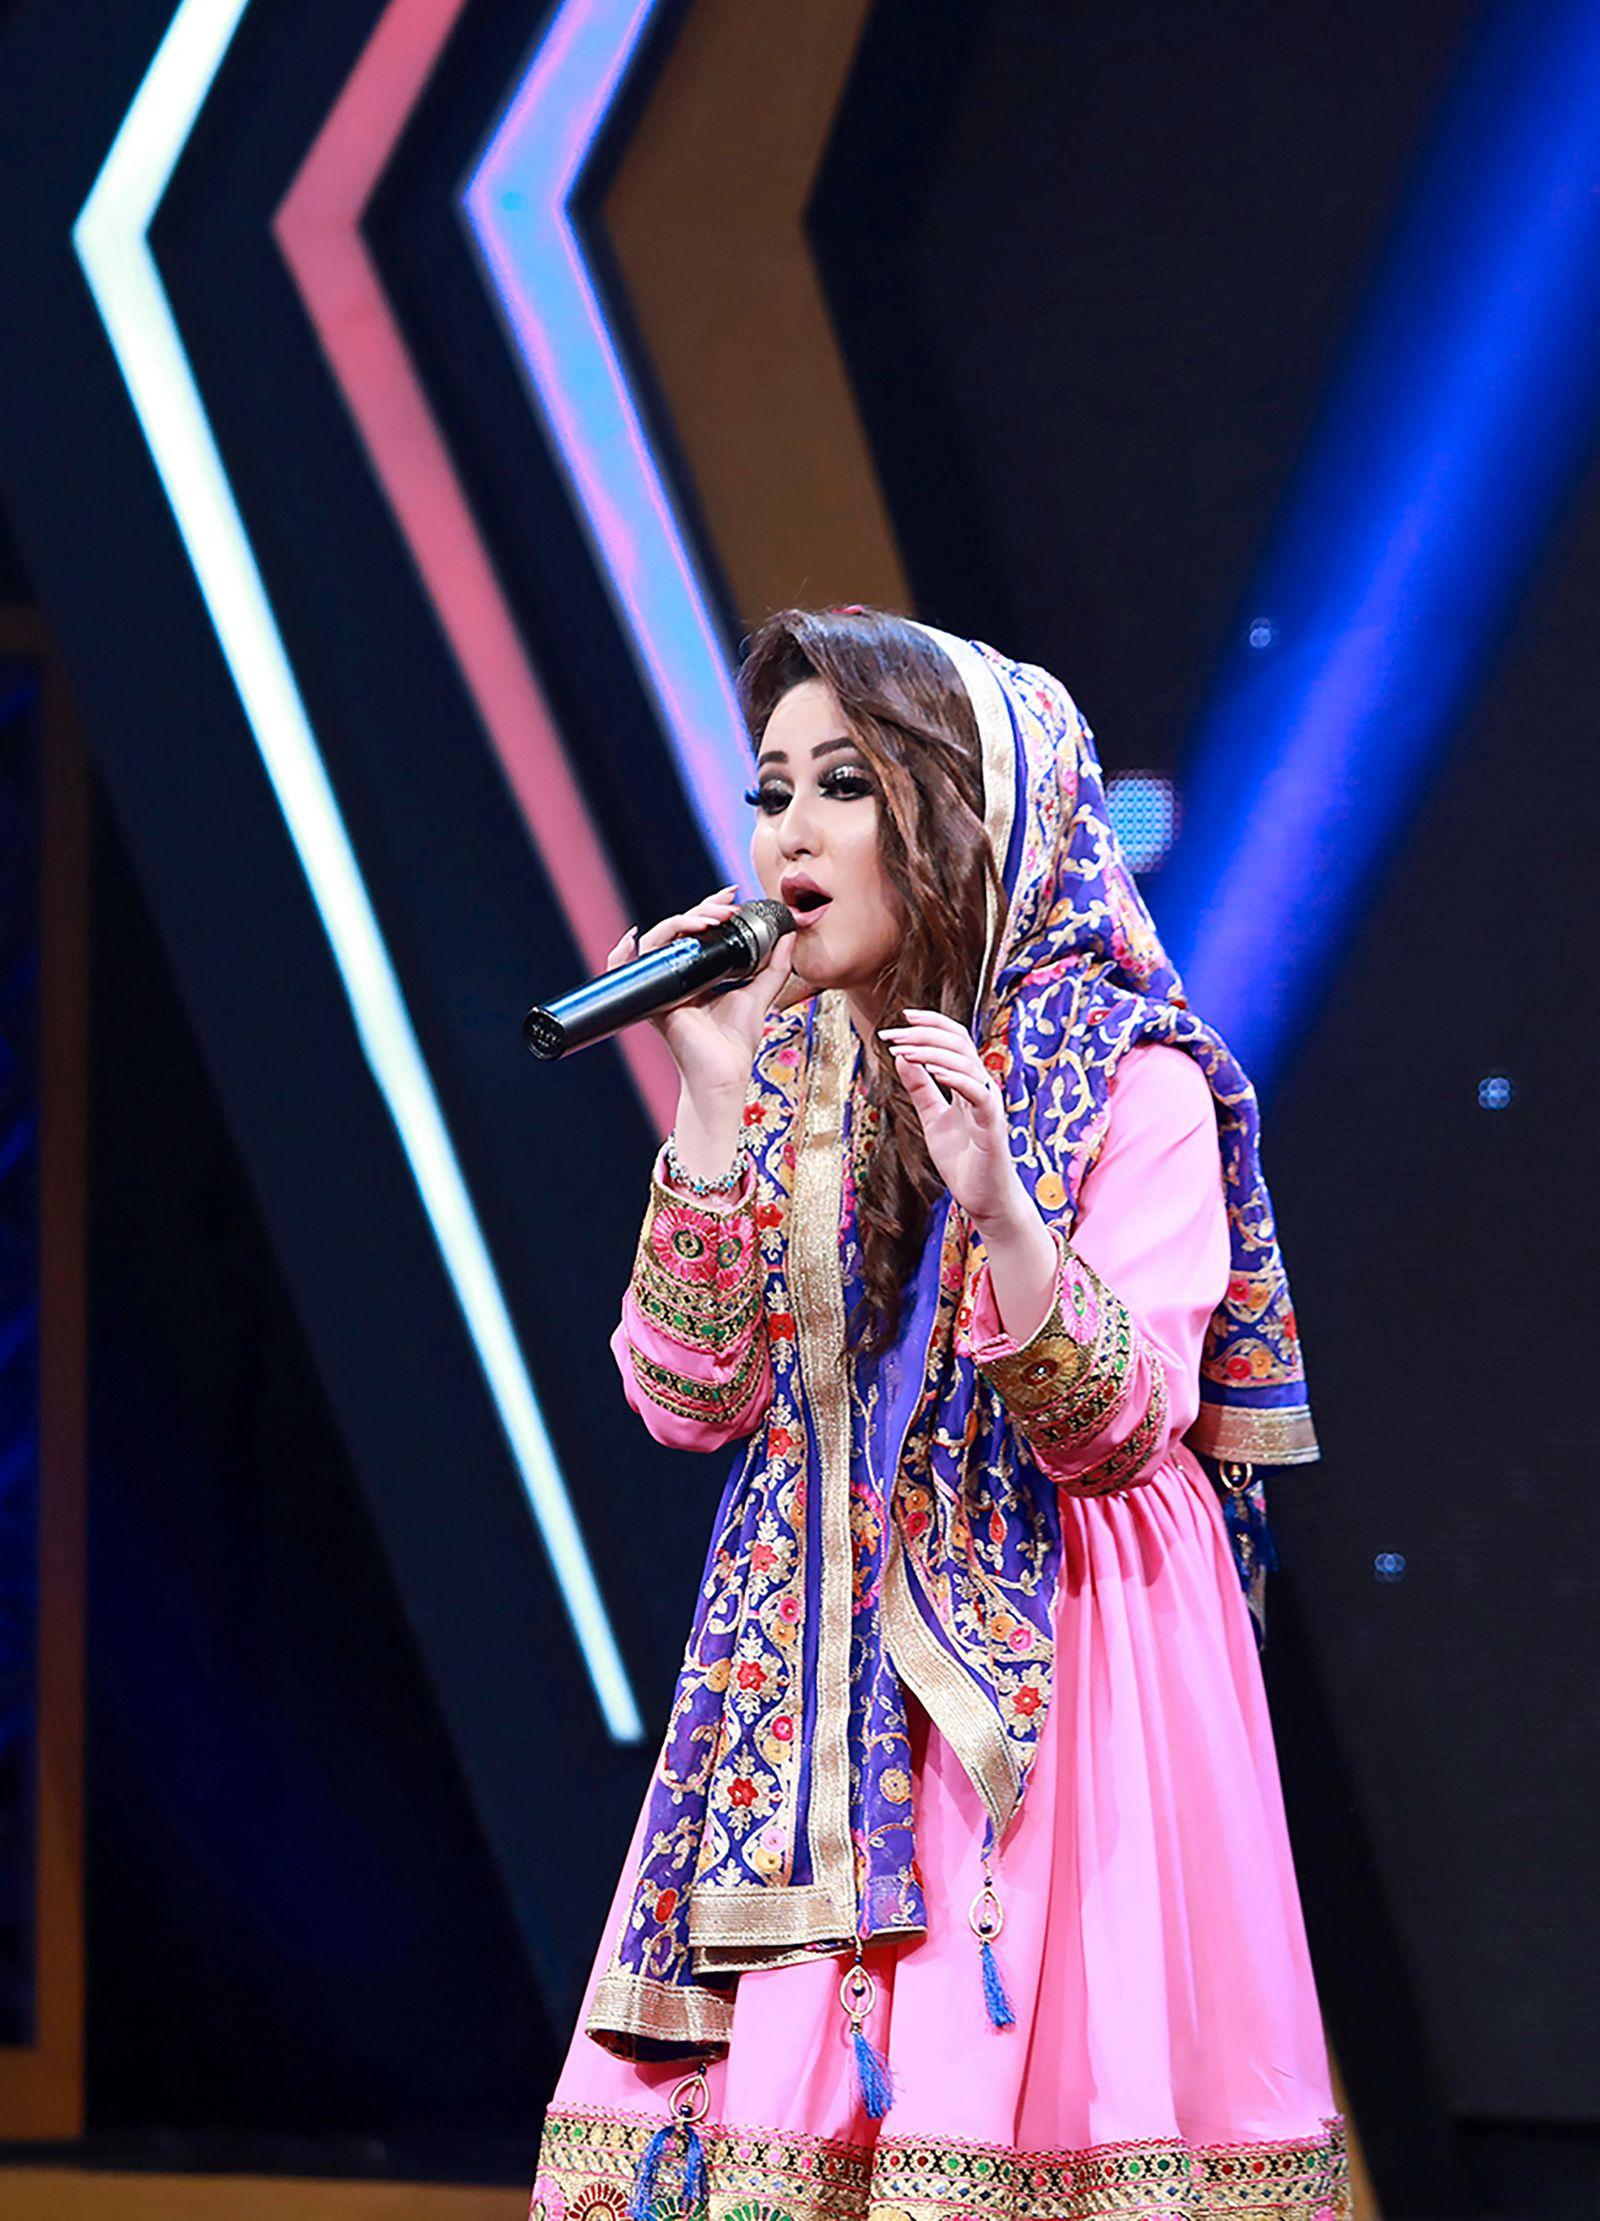 AFGHANISTAN-AFGHAN-STAR-MUSIC